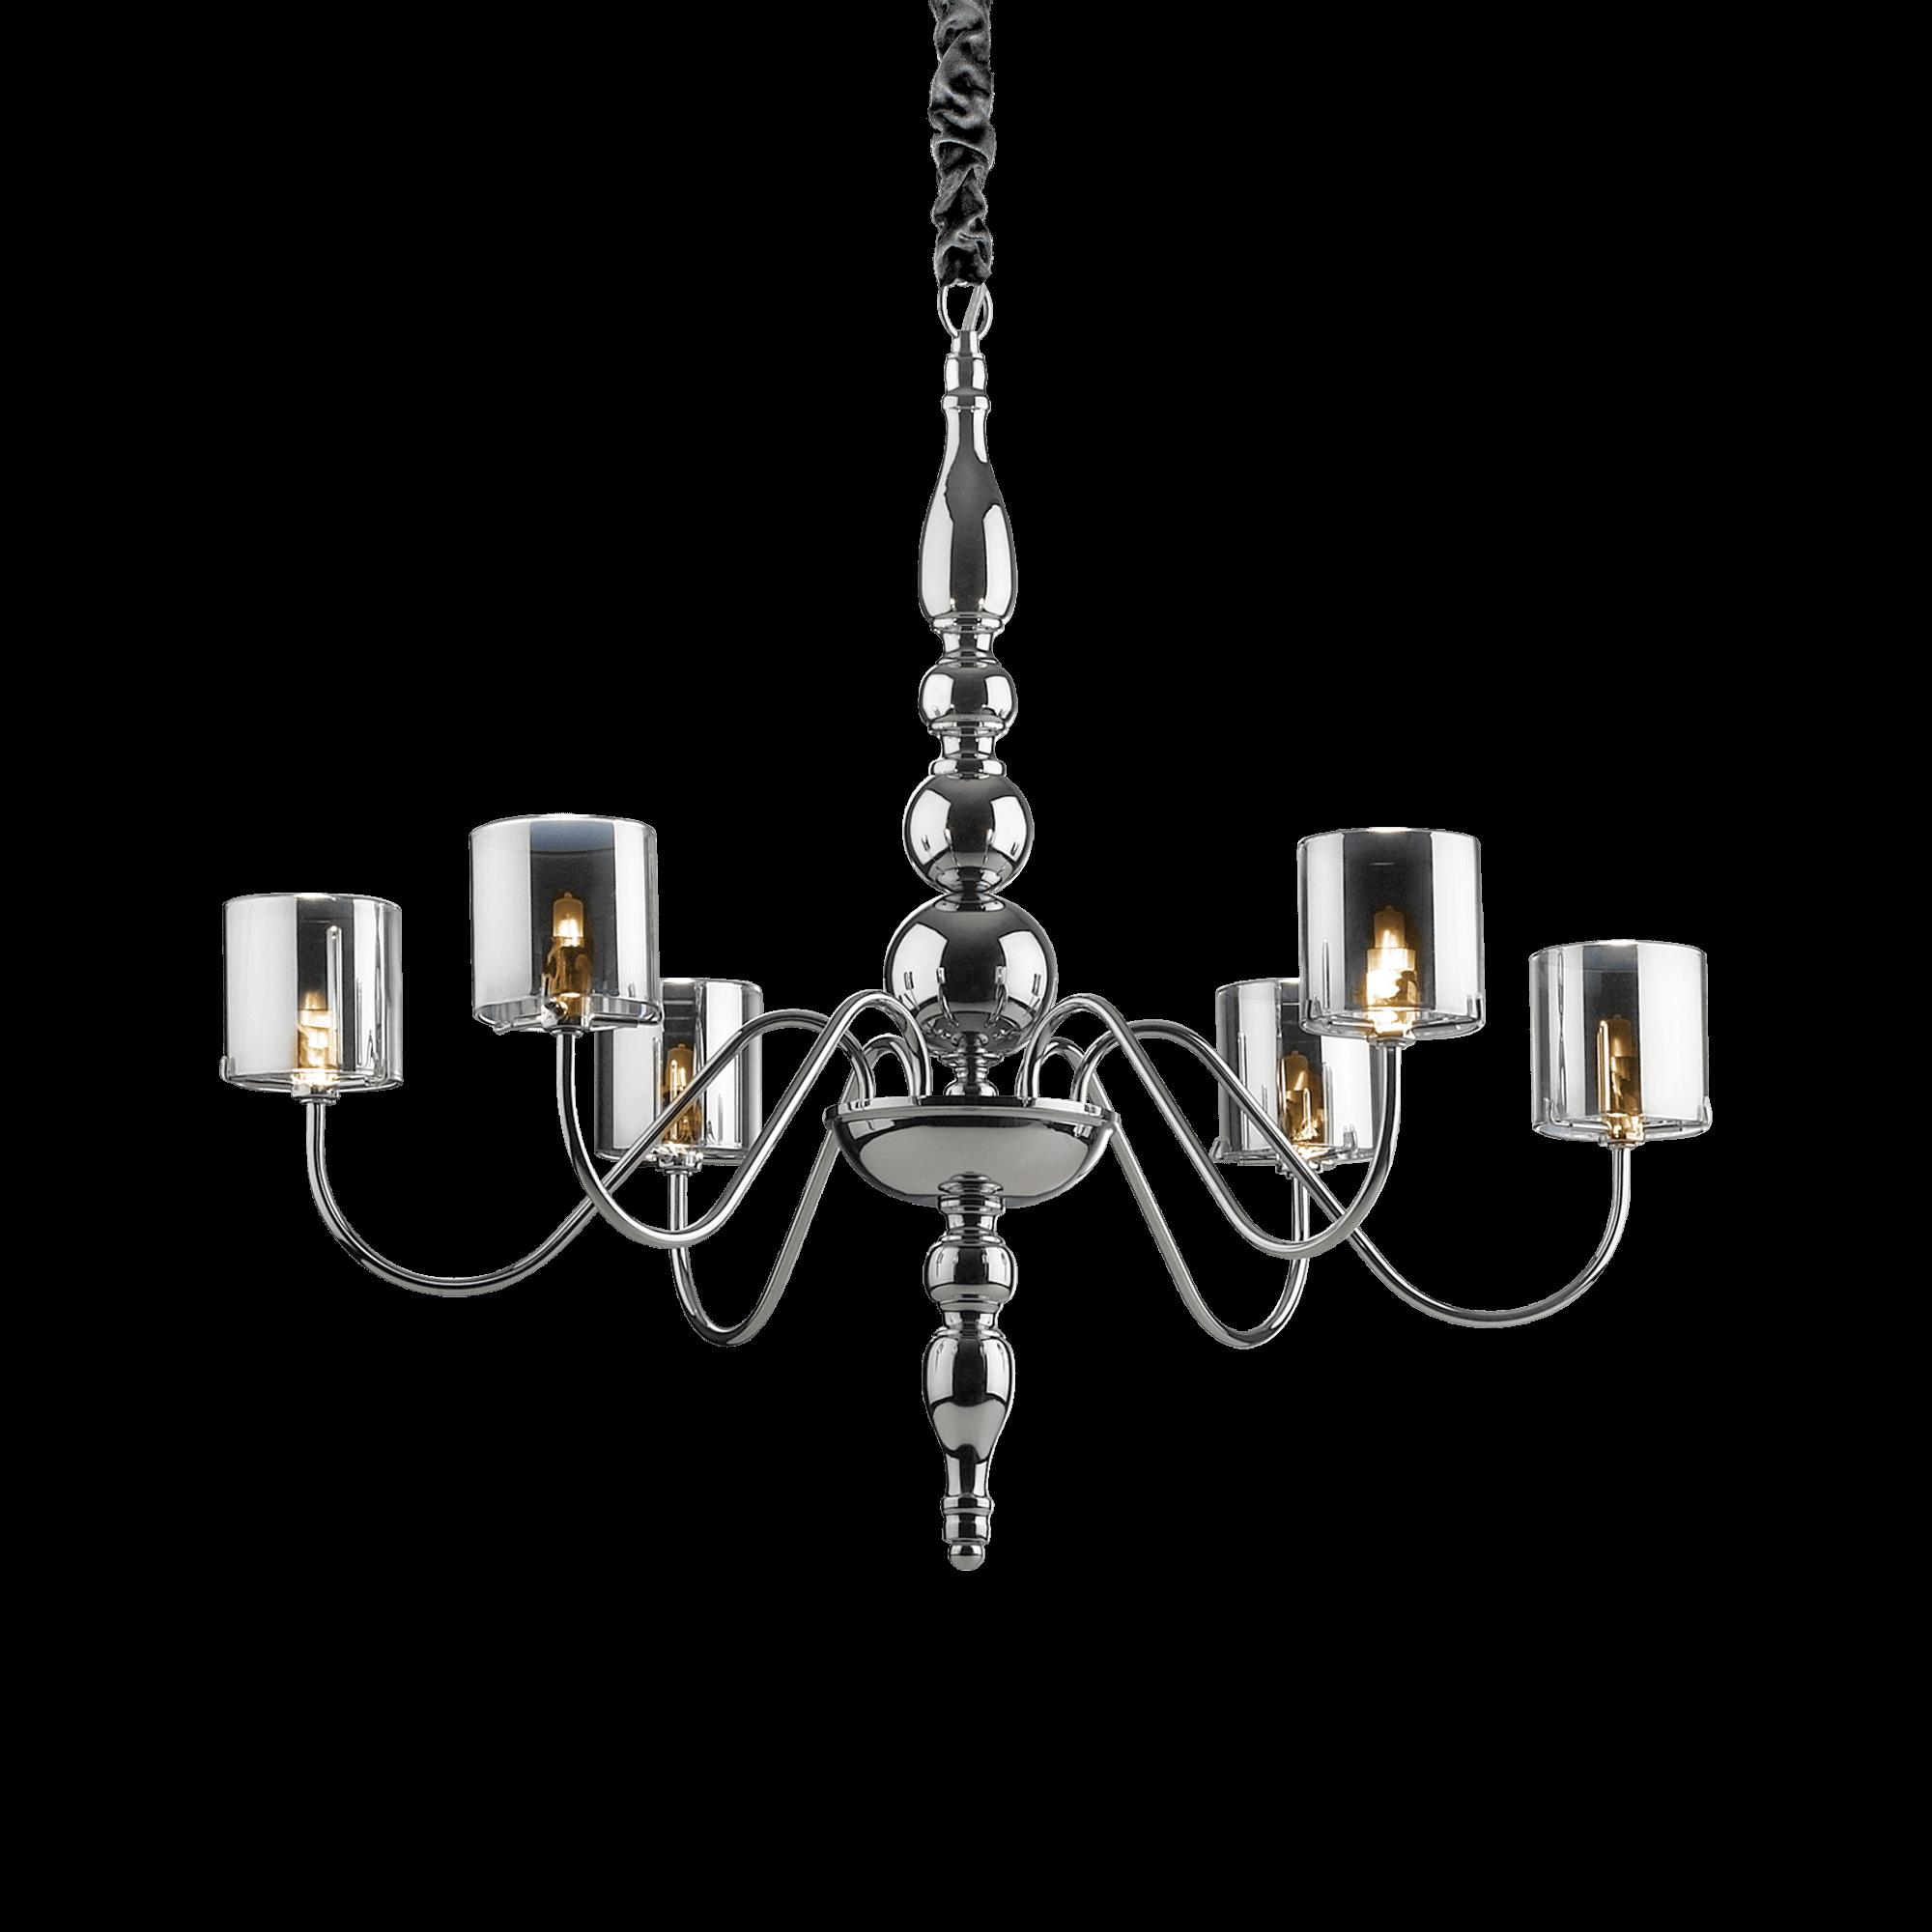 Ideal Lux 004556 Duca SP6 lámpa függeszték